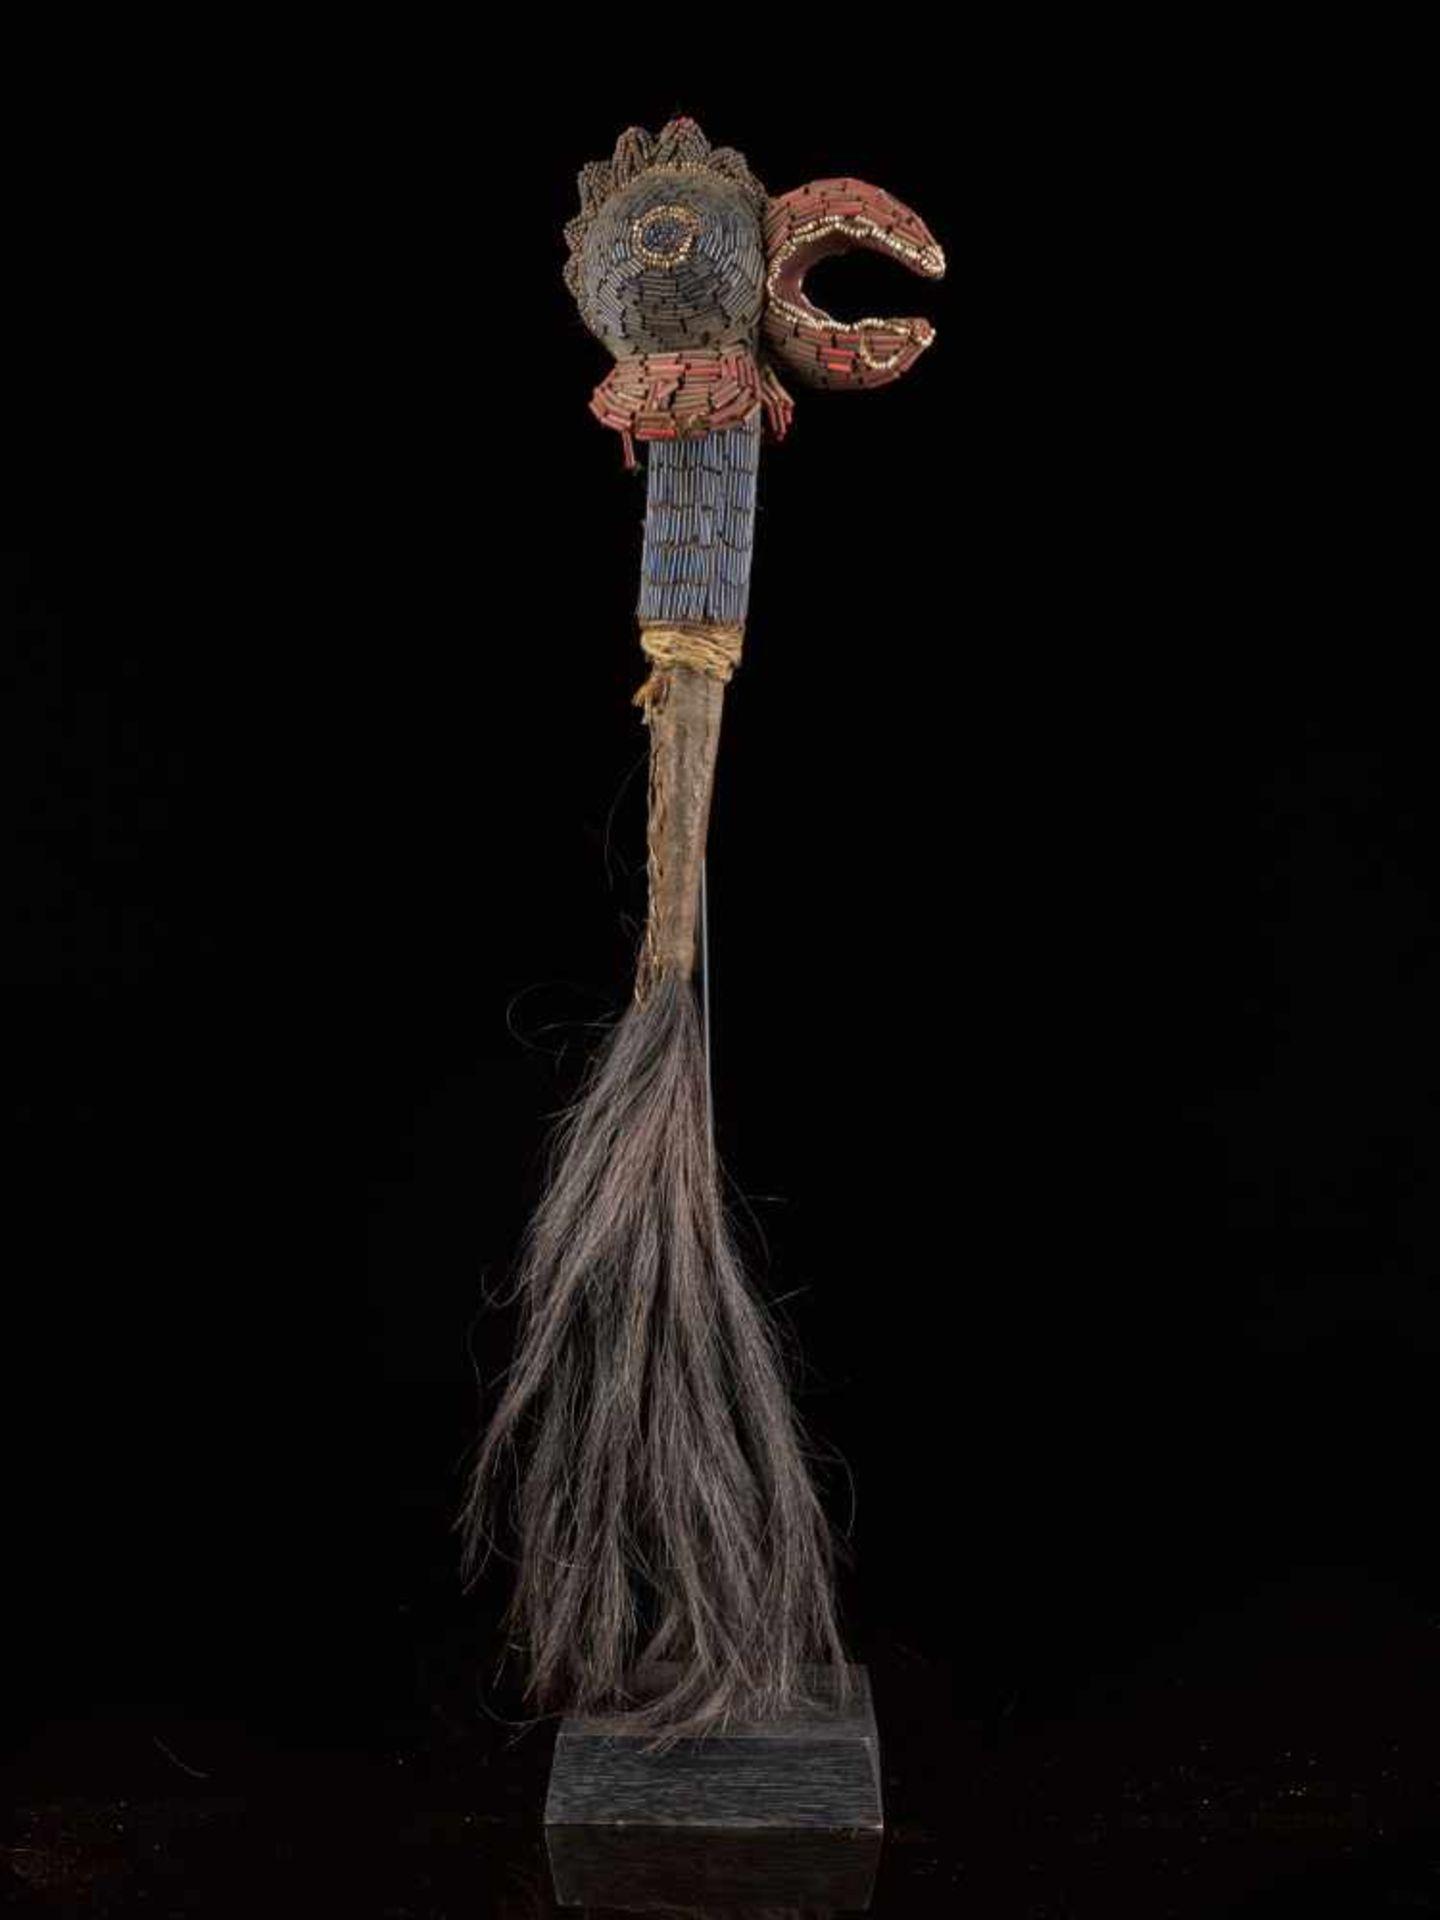 Beaded Flywhisk - Rooster - Tribal ArtThe Royal Fly Whisks (ethnic names: see leng koko or beuka)